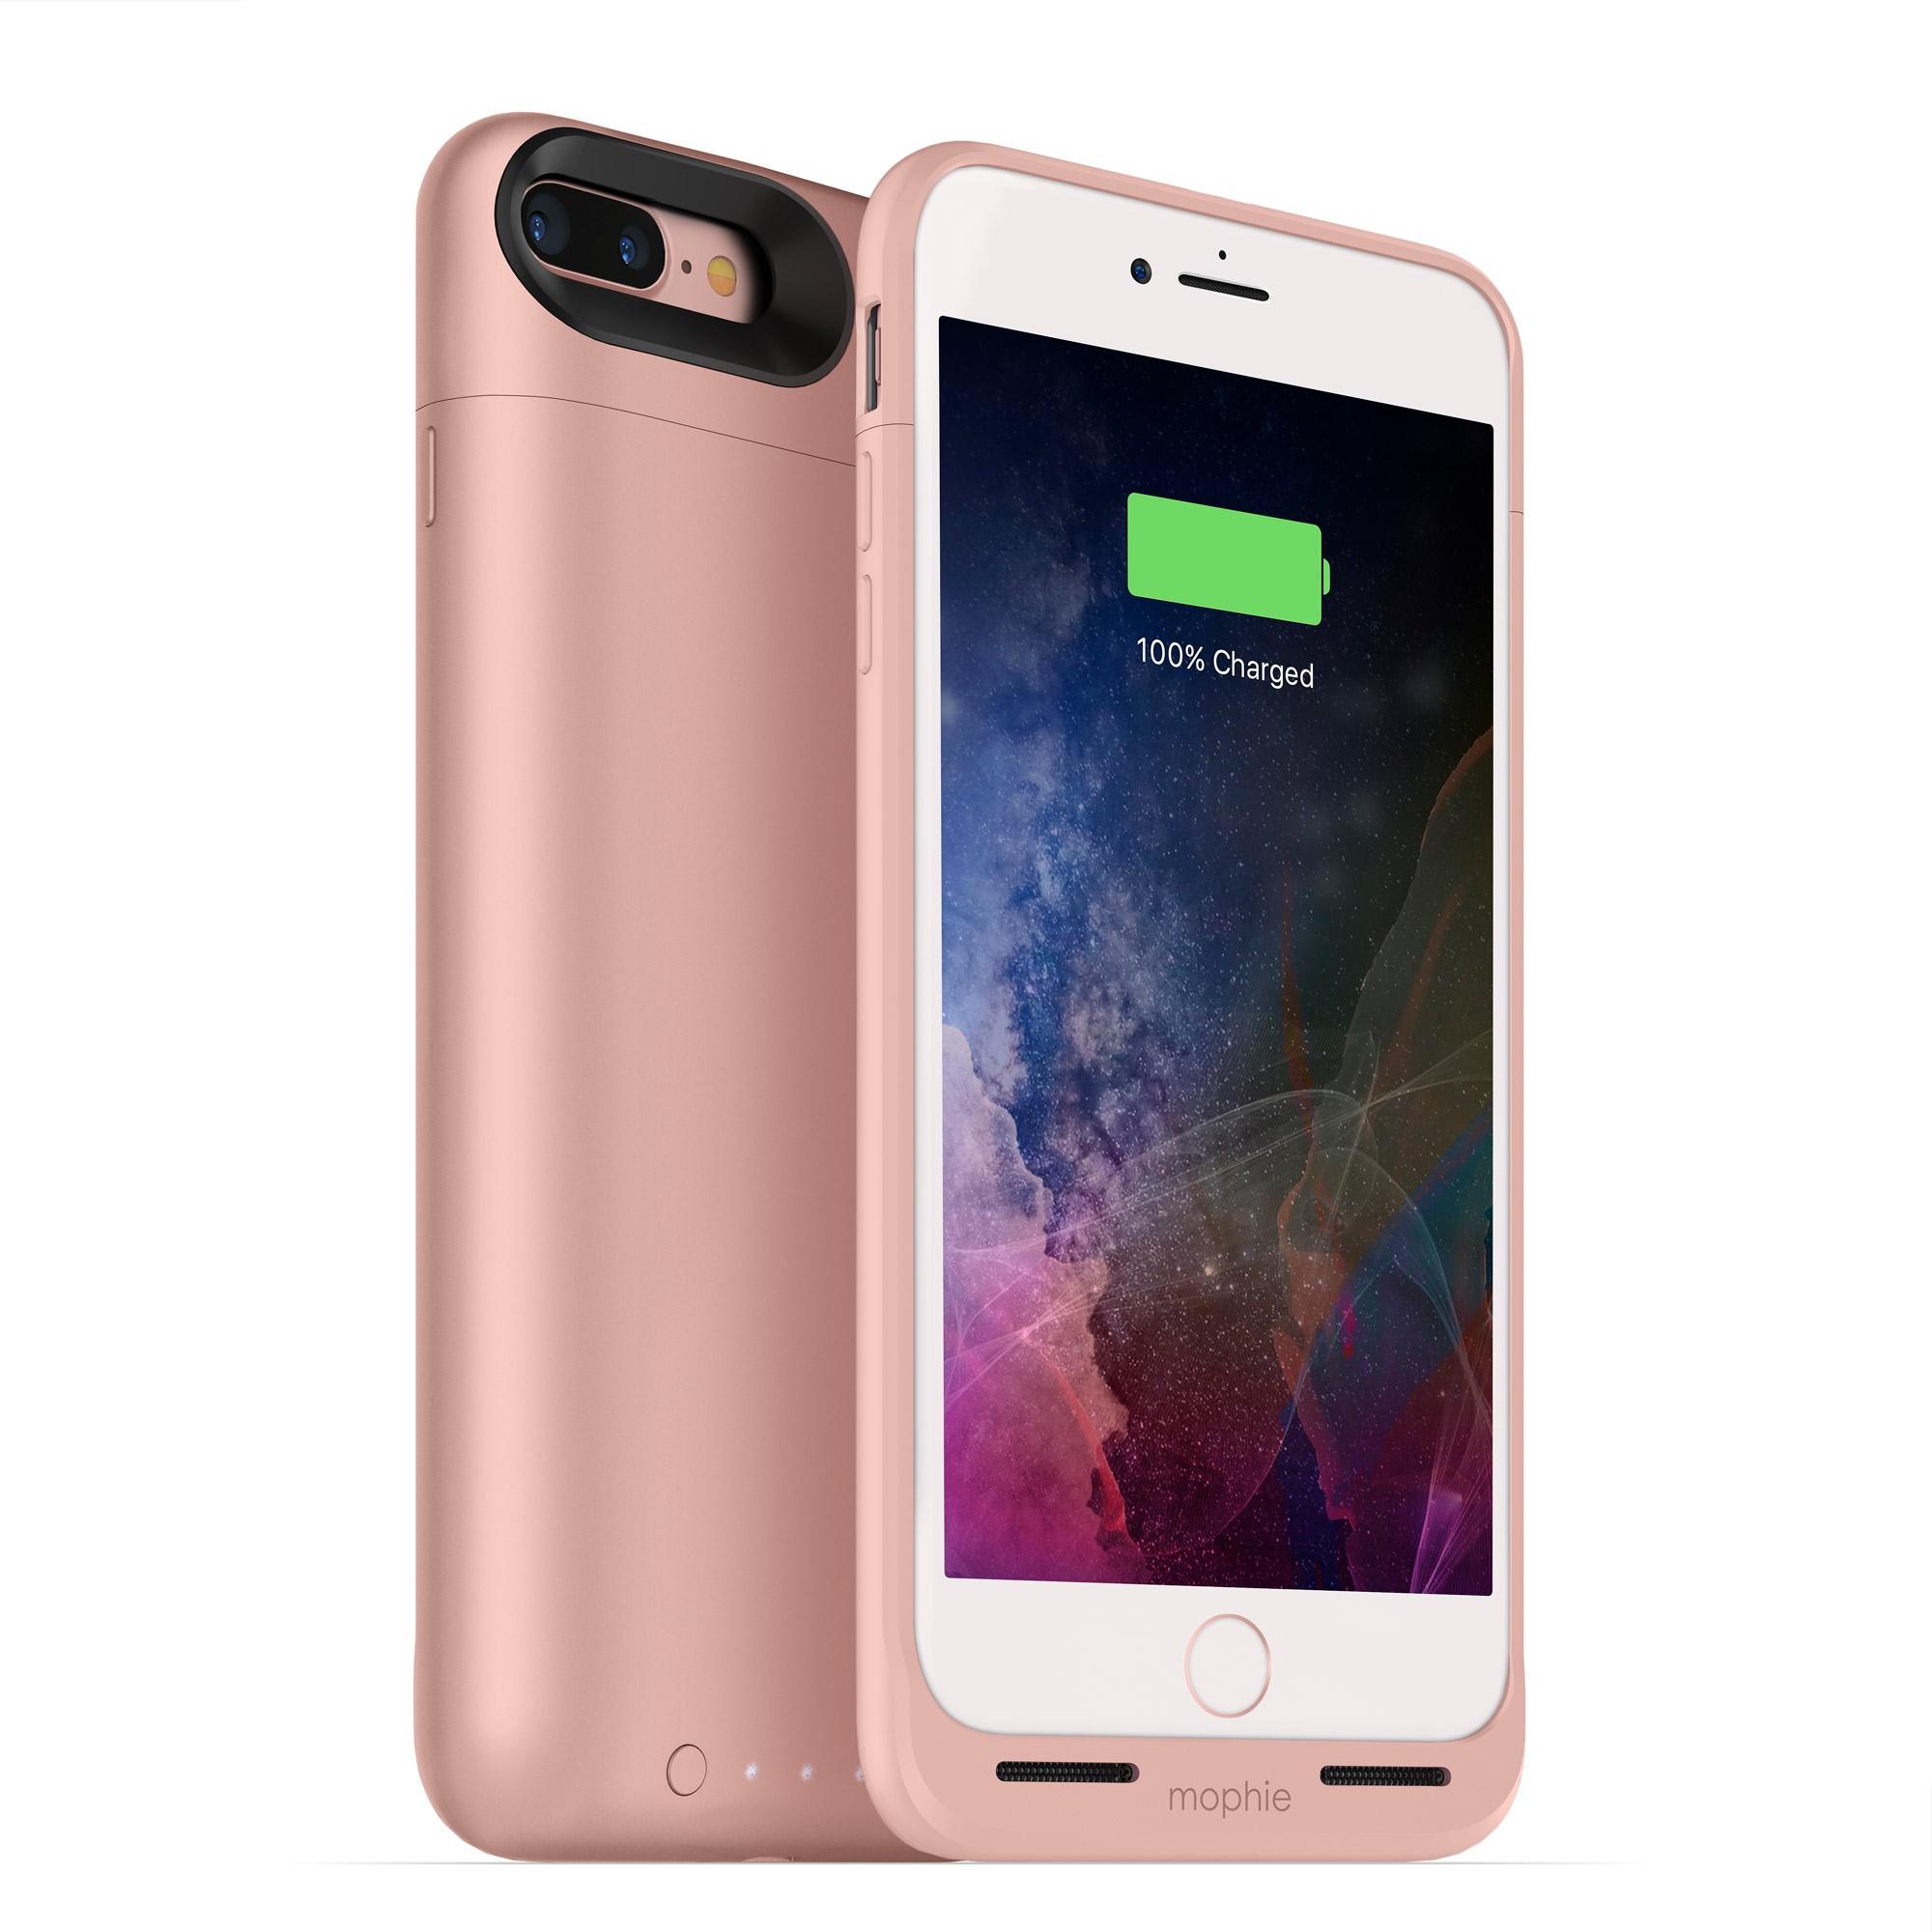 Nabíjecí pouzdro pro Apple iPhone 7 PLUS - Mophie, Juice Pack Air 2420mAh Rose Gold